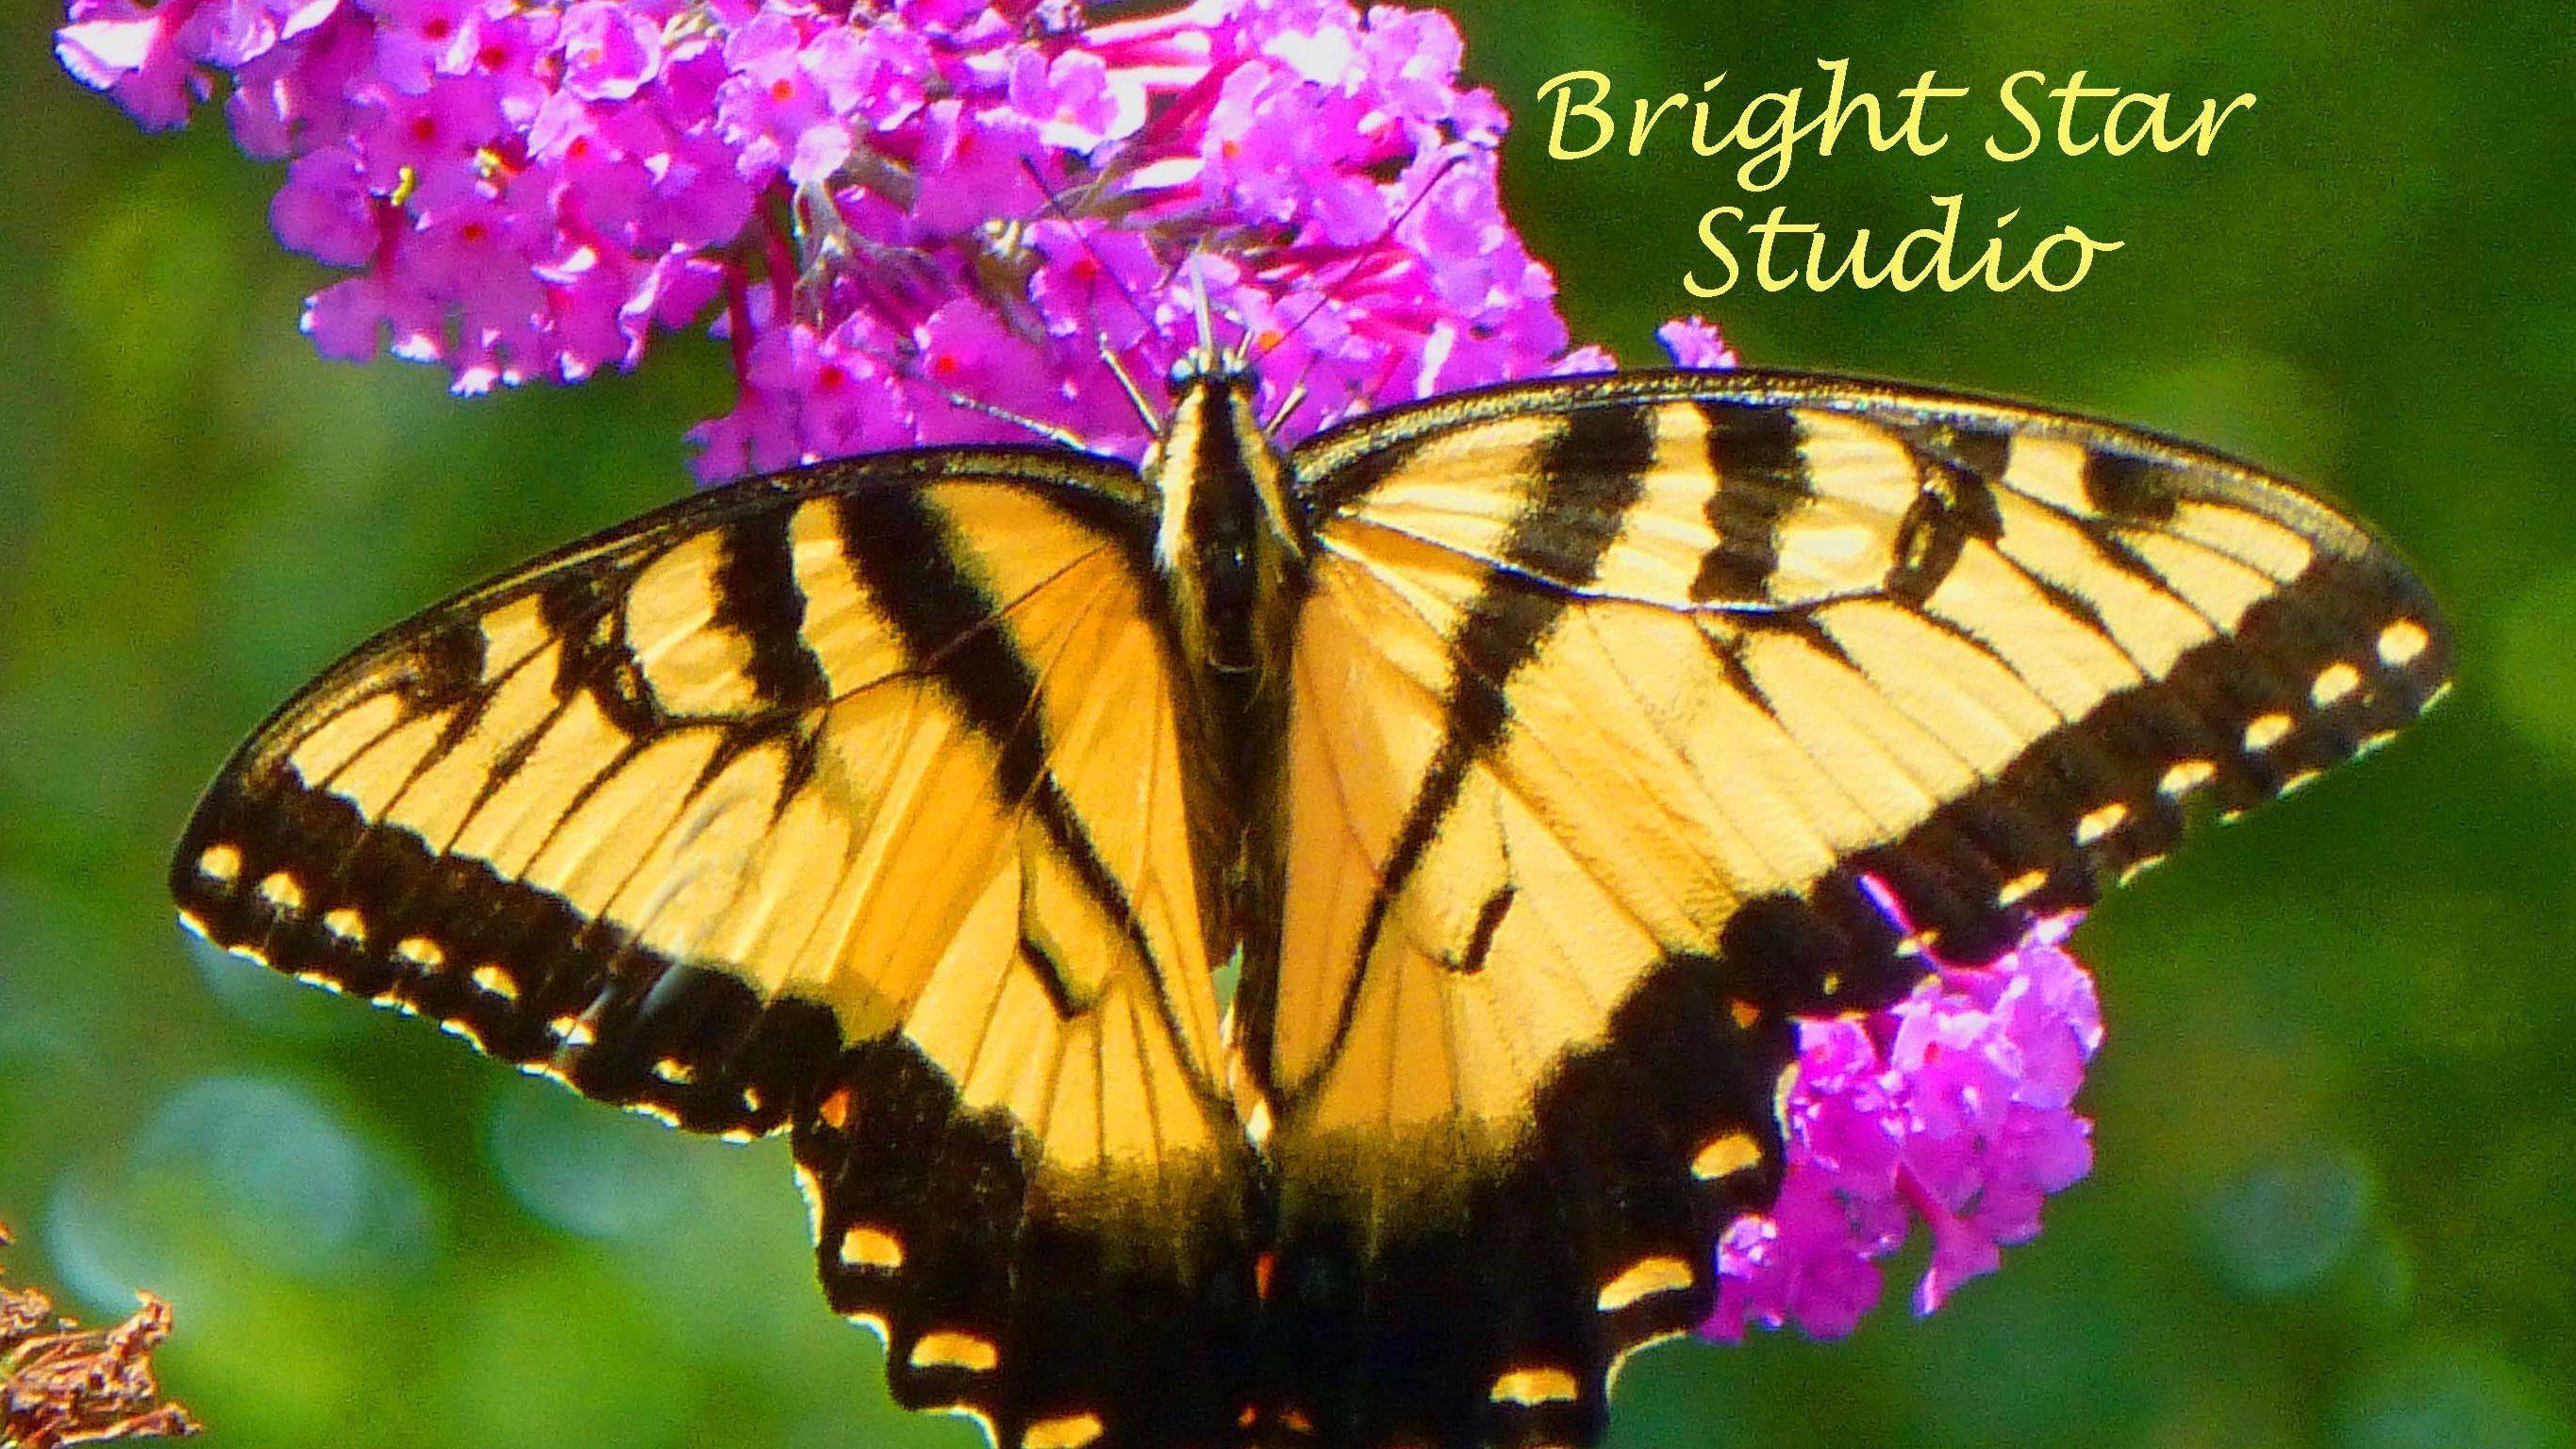 Bright Star Studio